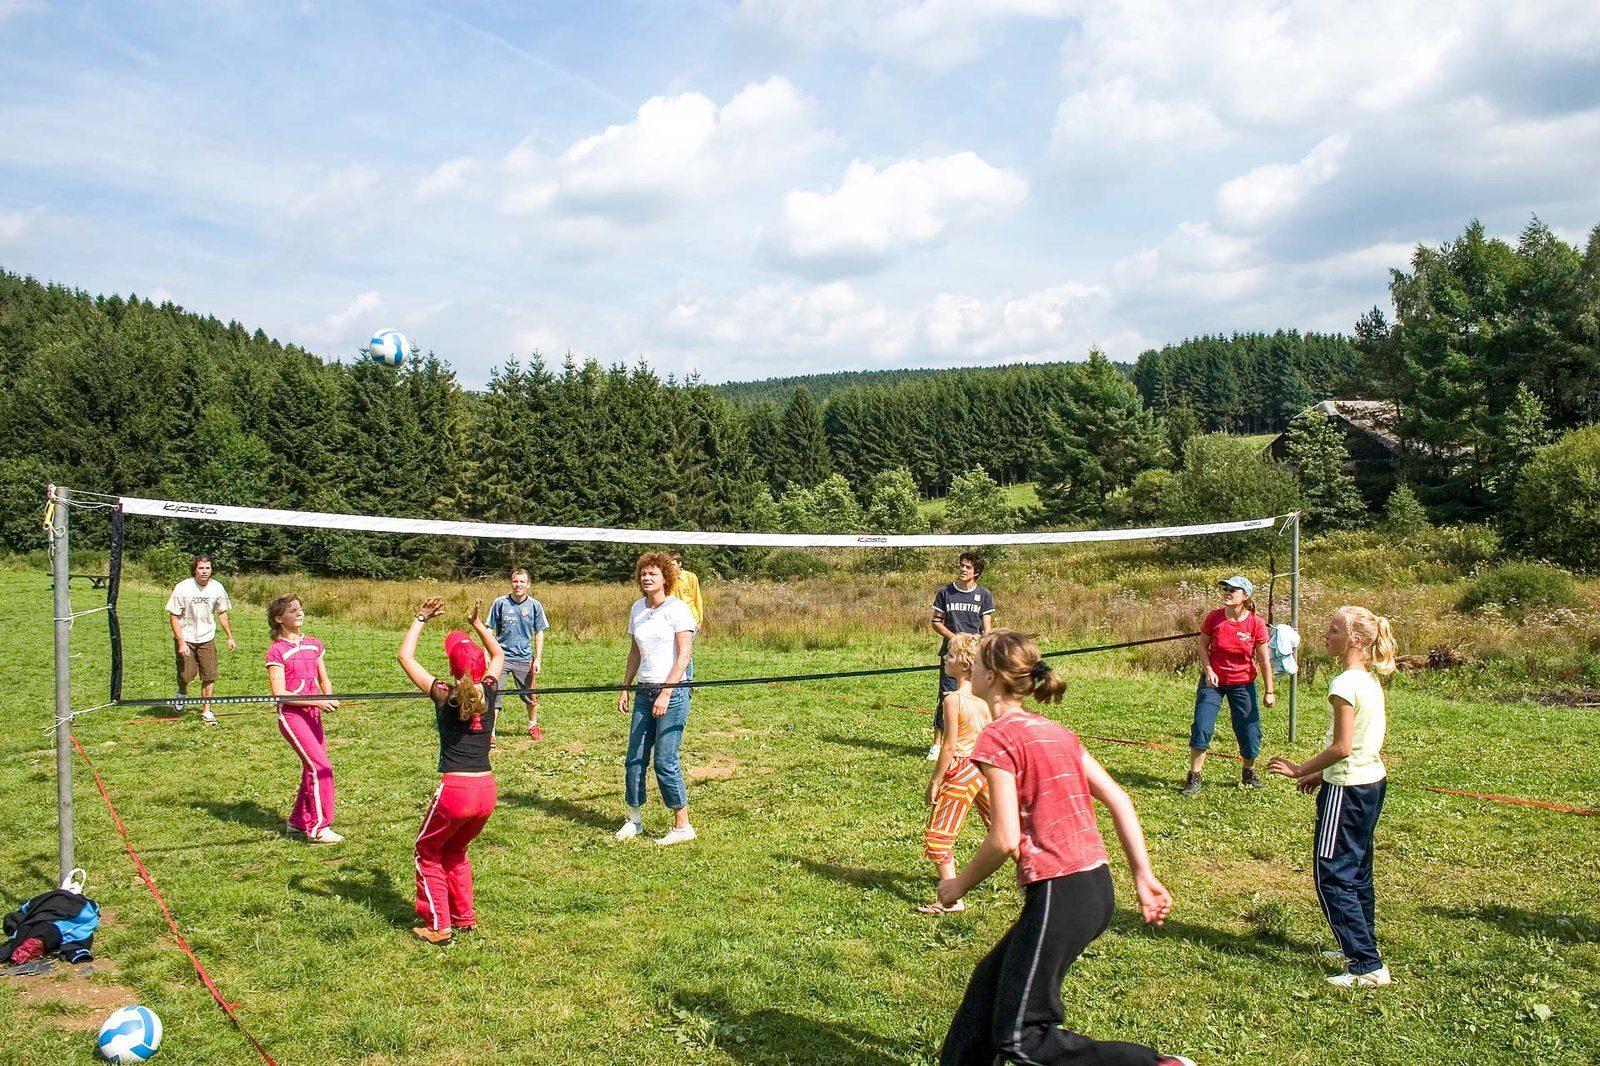 Installations - Terrain de jeu| Petite Suisse